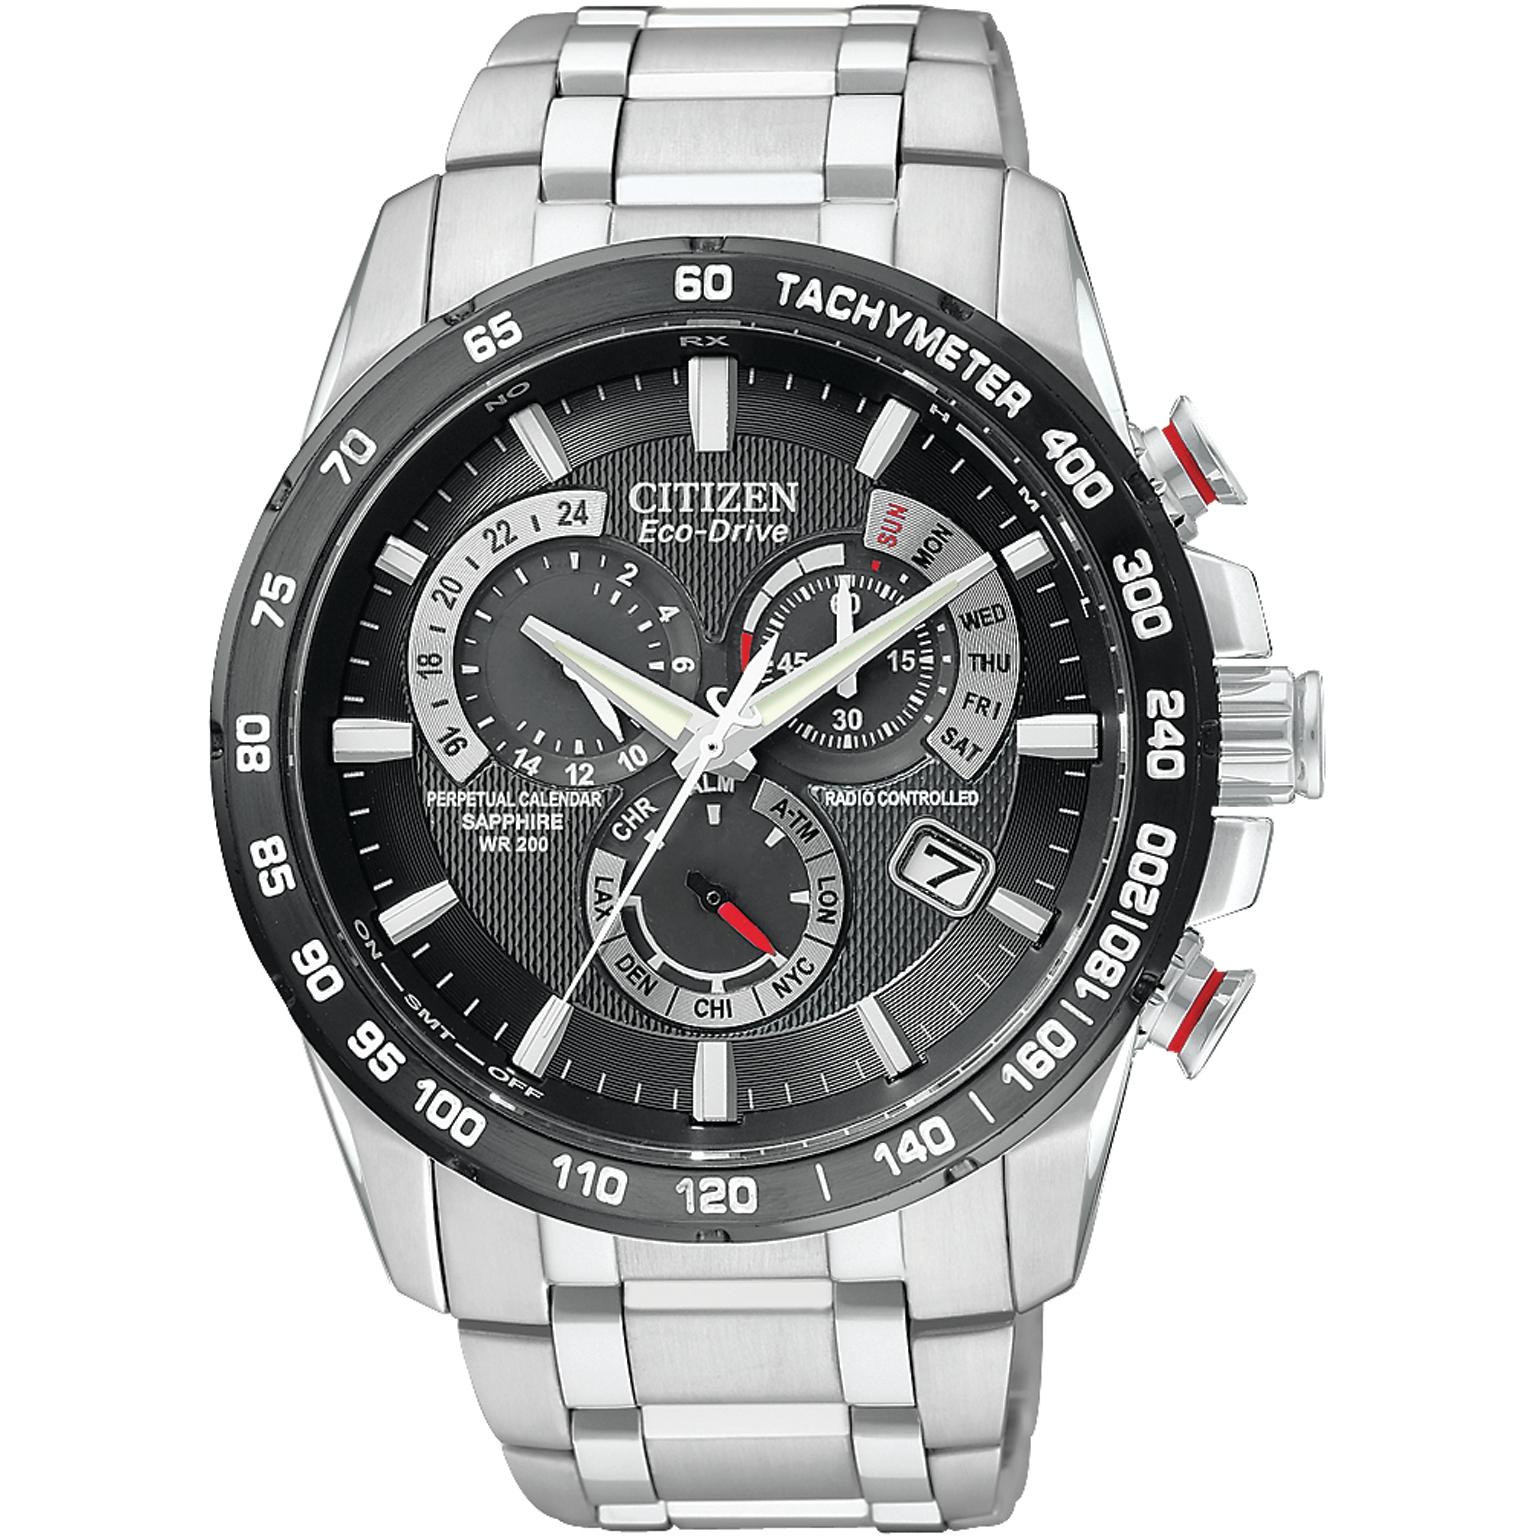 e7b97638e Mens Citizen Chrono Perpetual A-T Alarm Chronograph Radio Controlled Watch  AT4008-51E